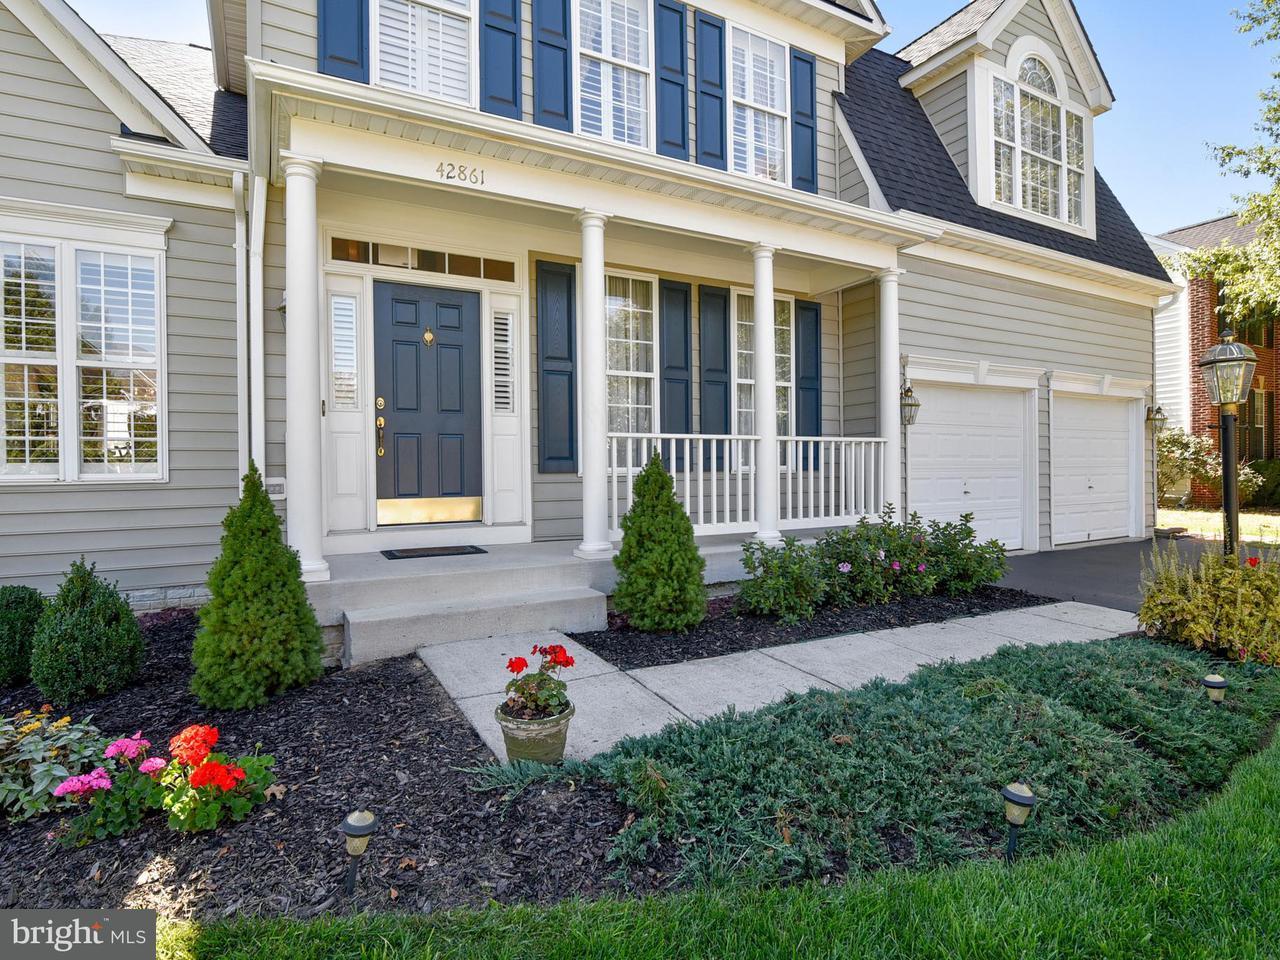 独户住宅 为 销售 在 42861 VESTALS GAP Drive 42861 VESTALS GAP Drive Broadlands, 弗吉尼亚州 20148 美国